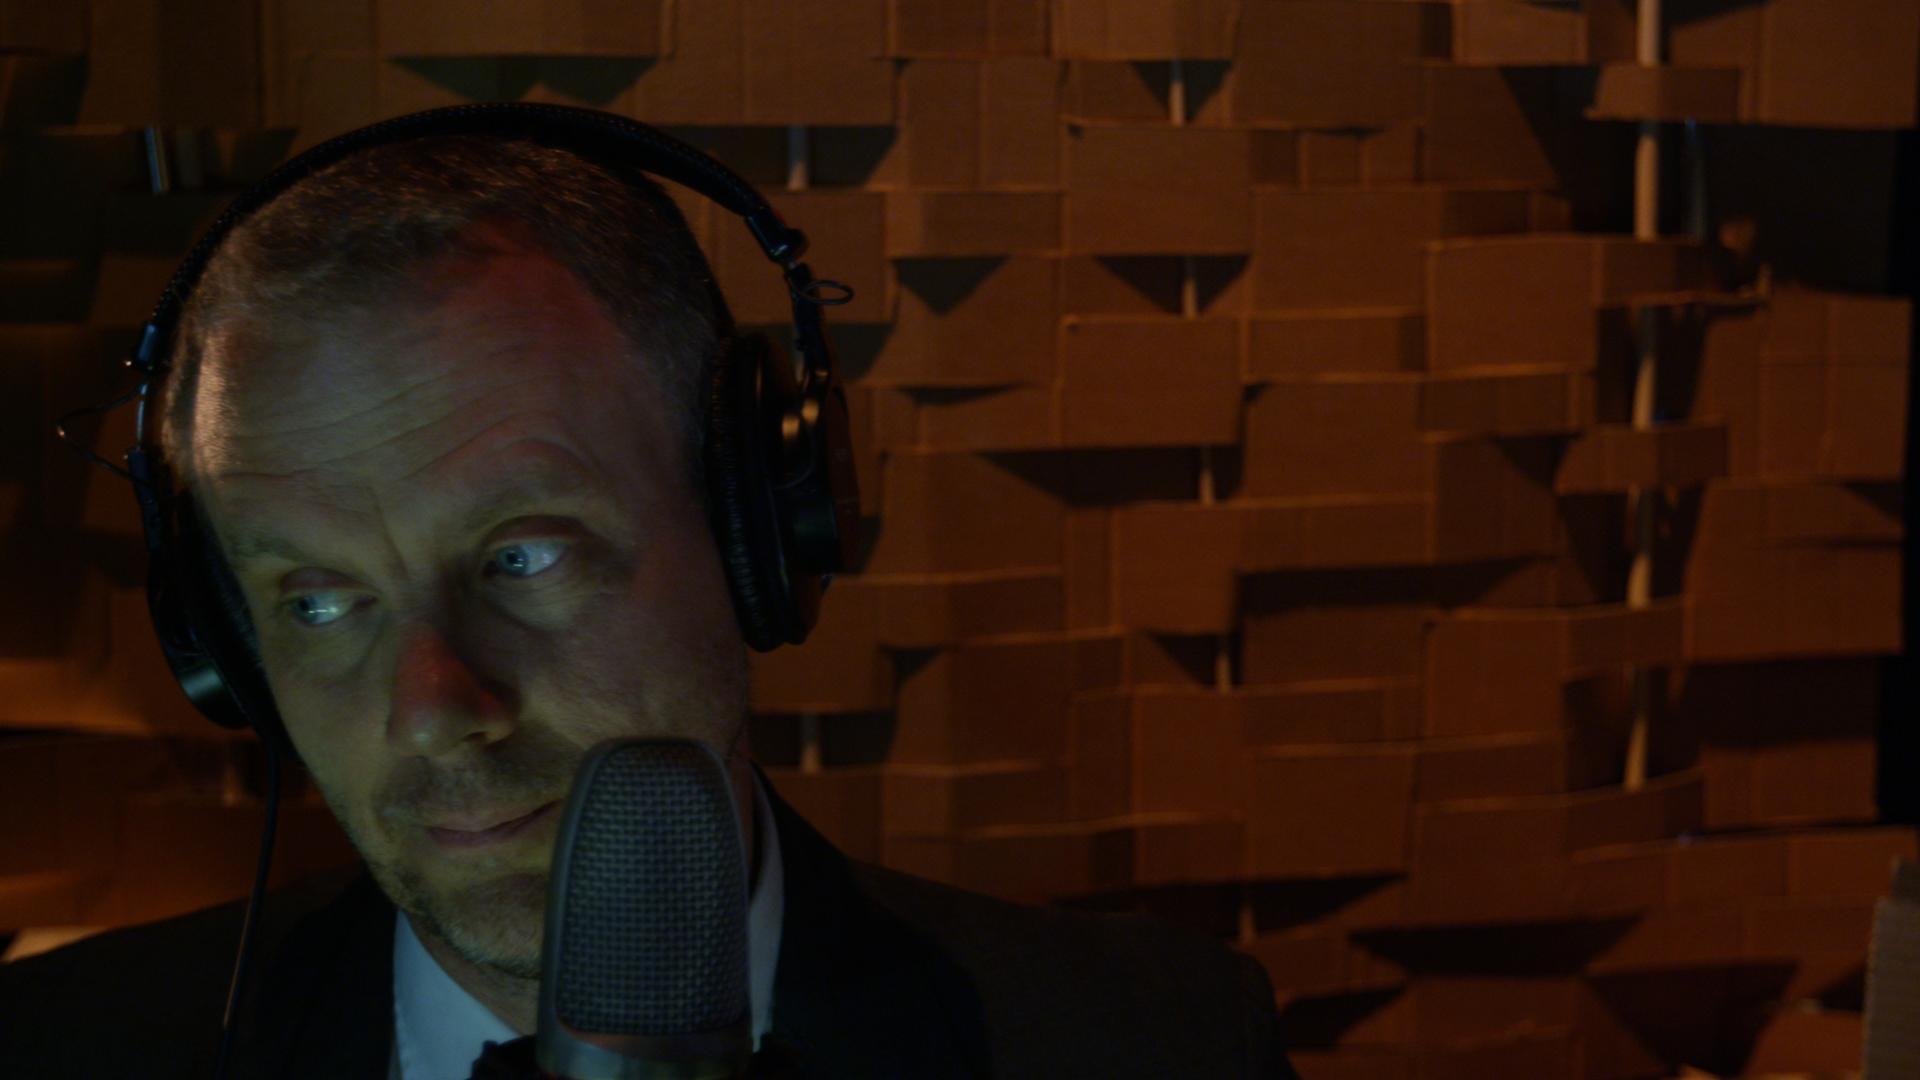 The DJ at WJNG radio